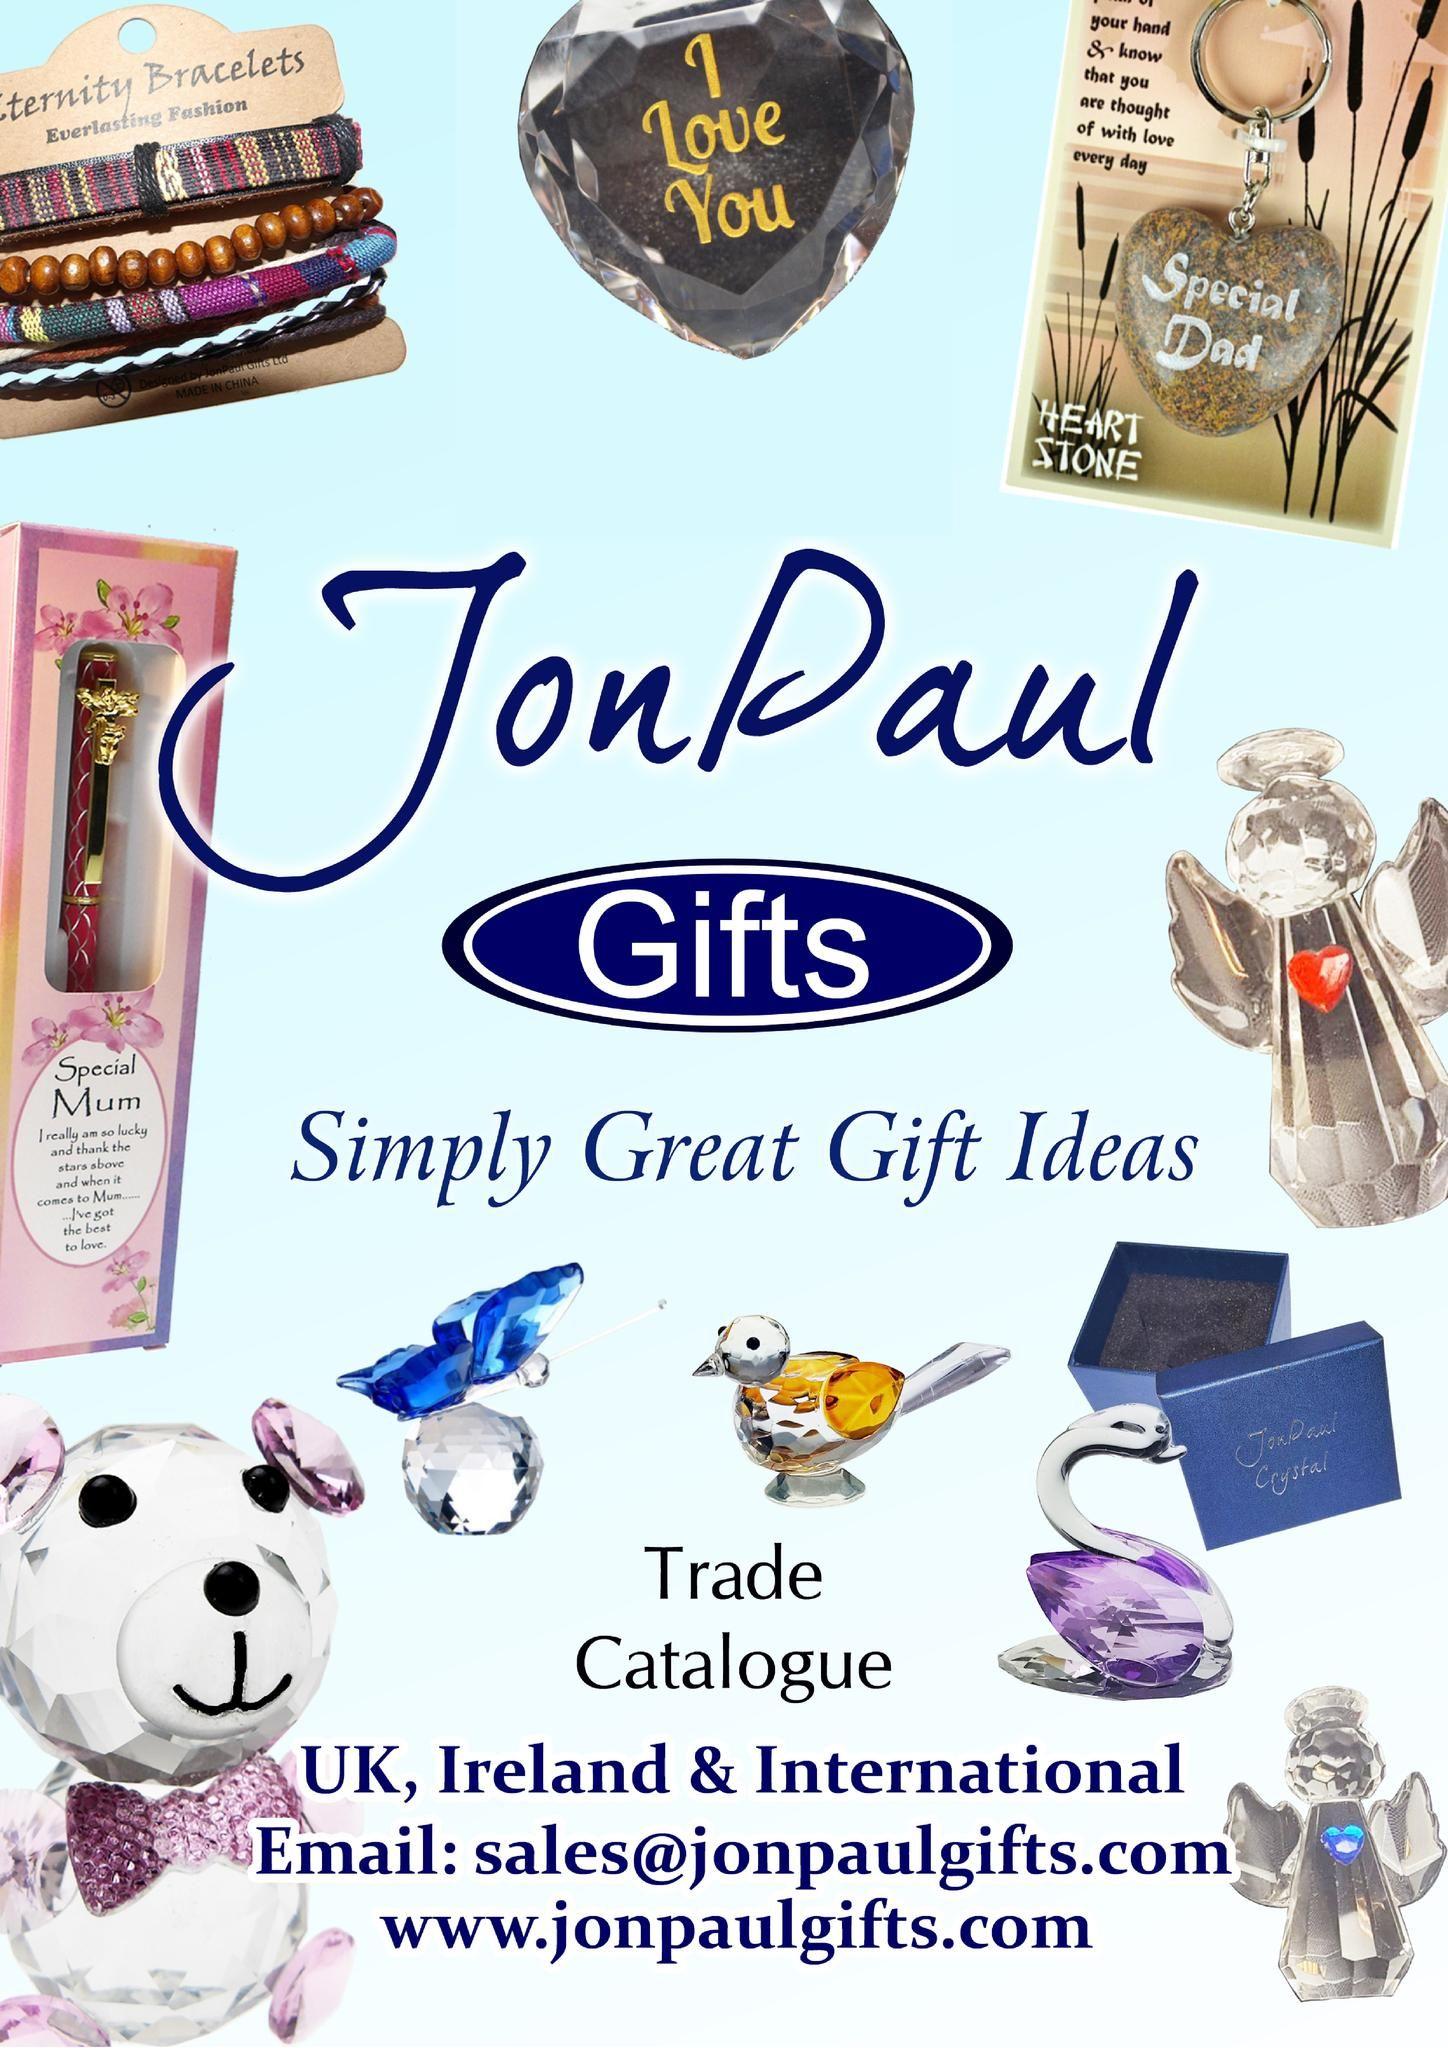 Jonpaul Gifts Ltd